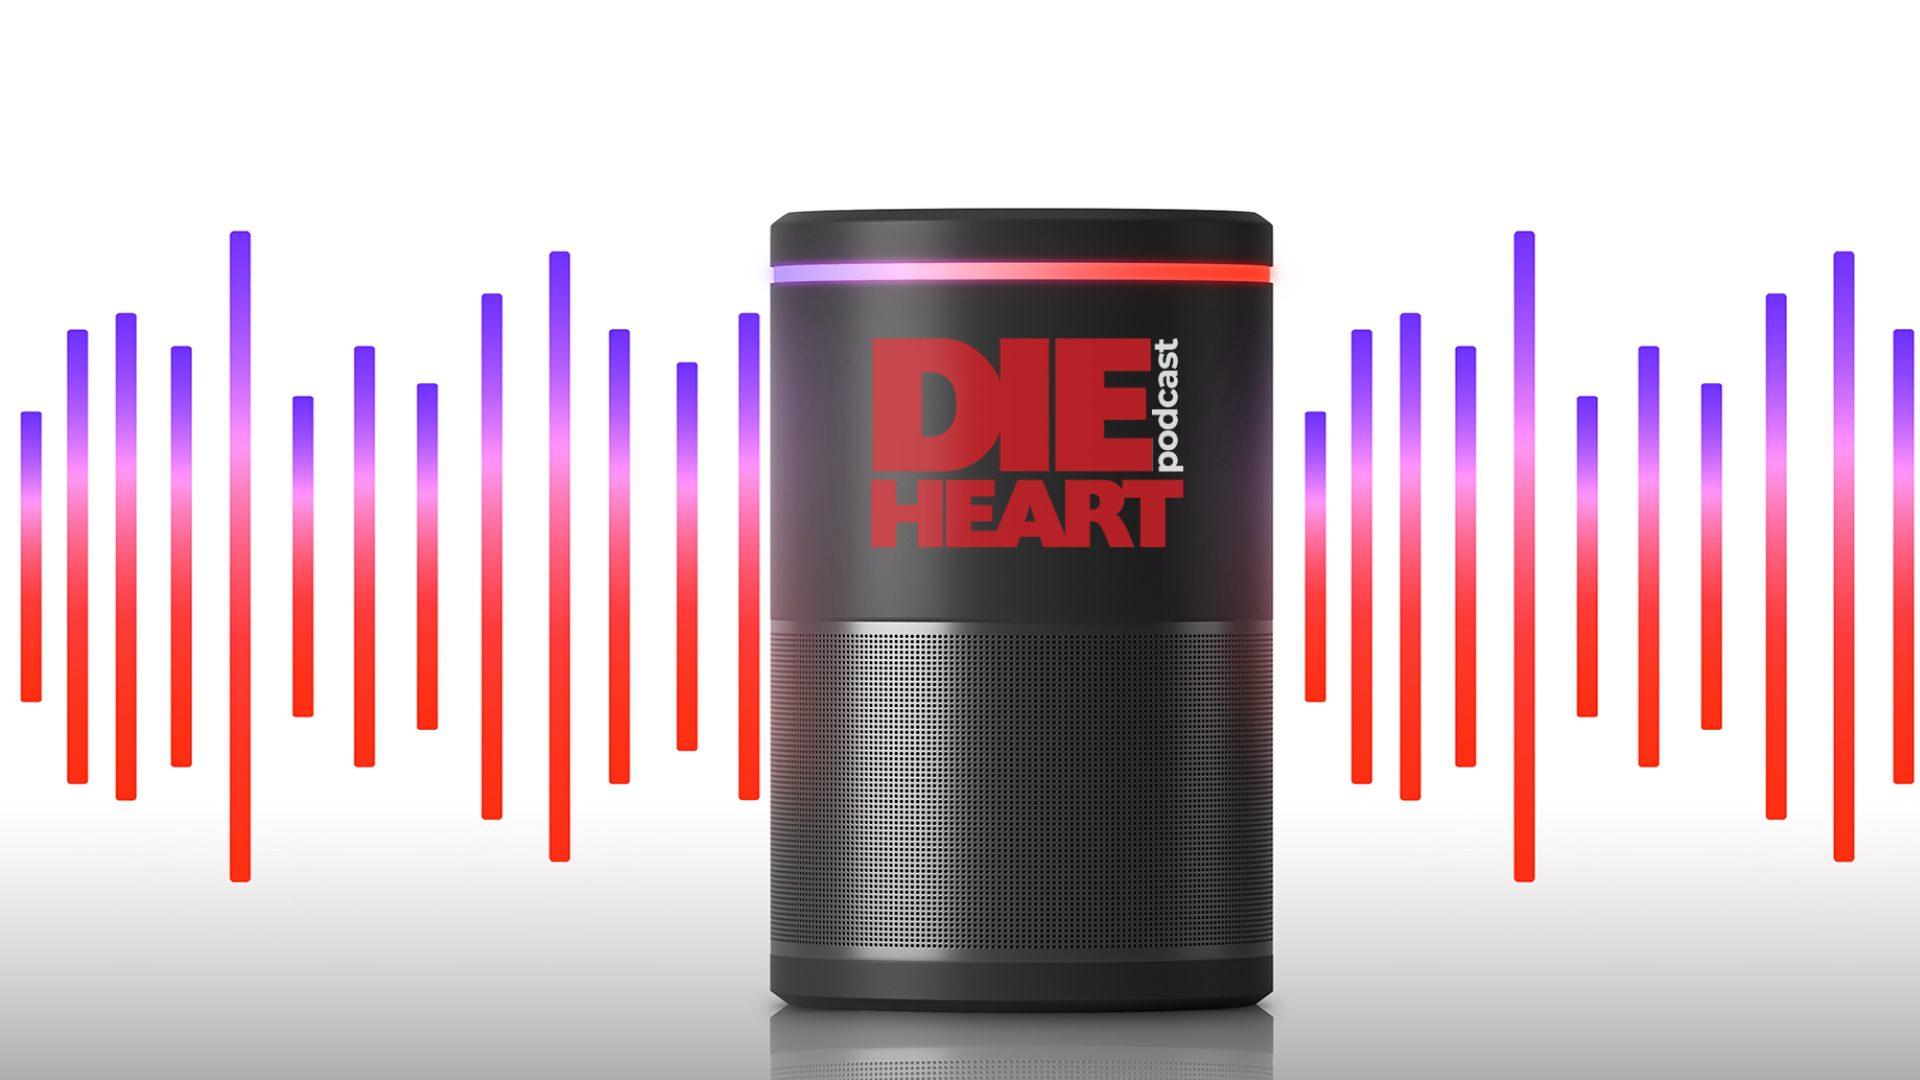 Die Heart Podcast - Logo Design Mockup 01